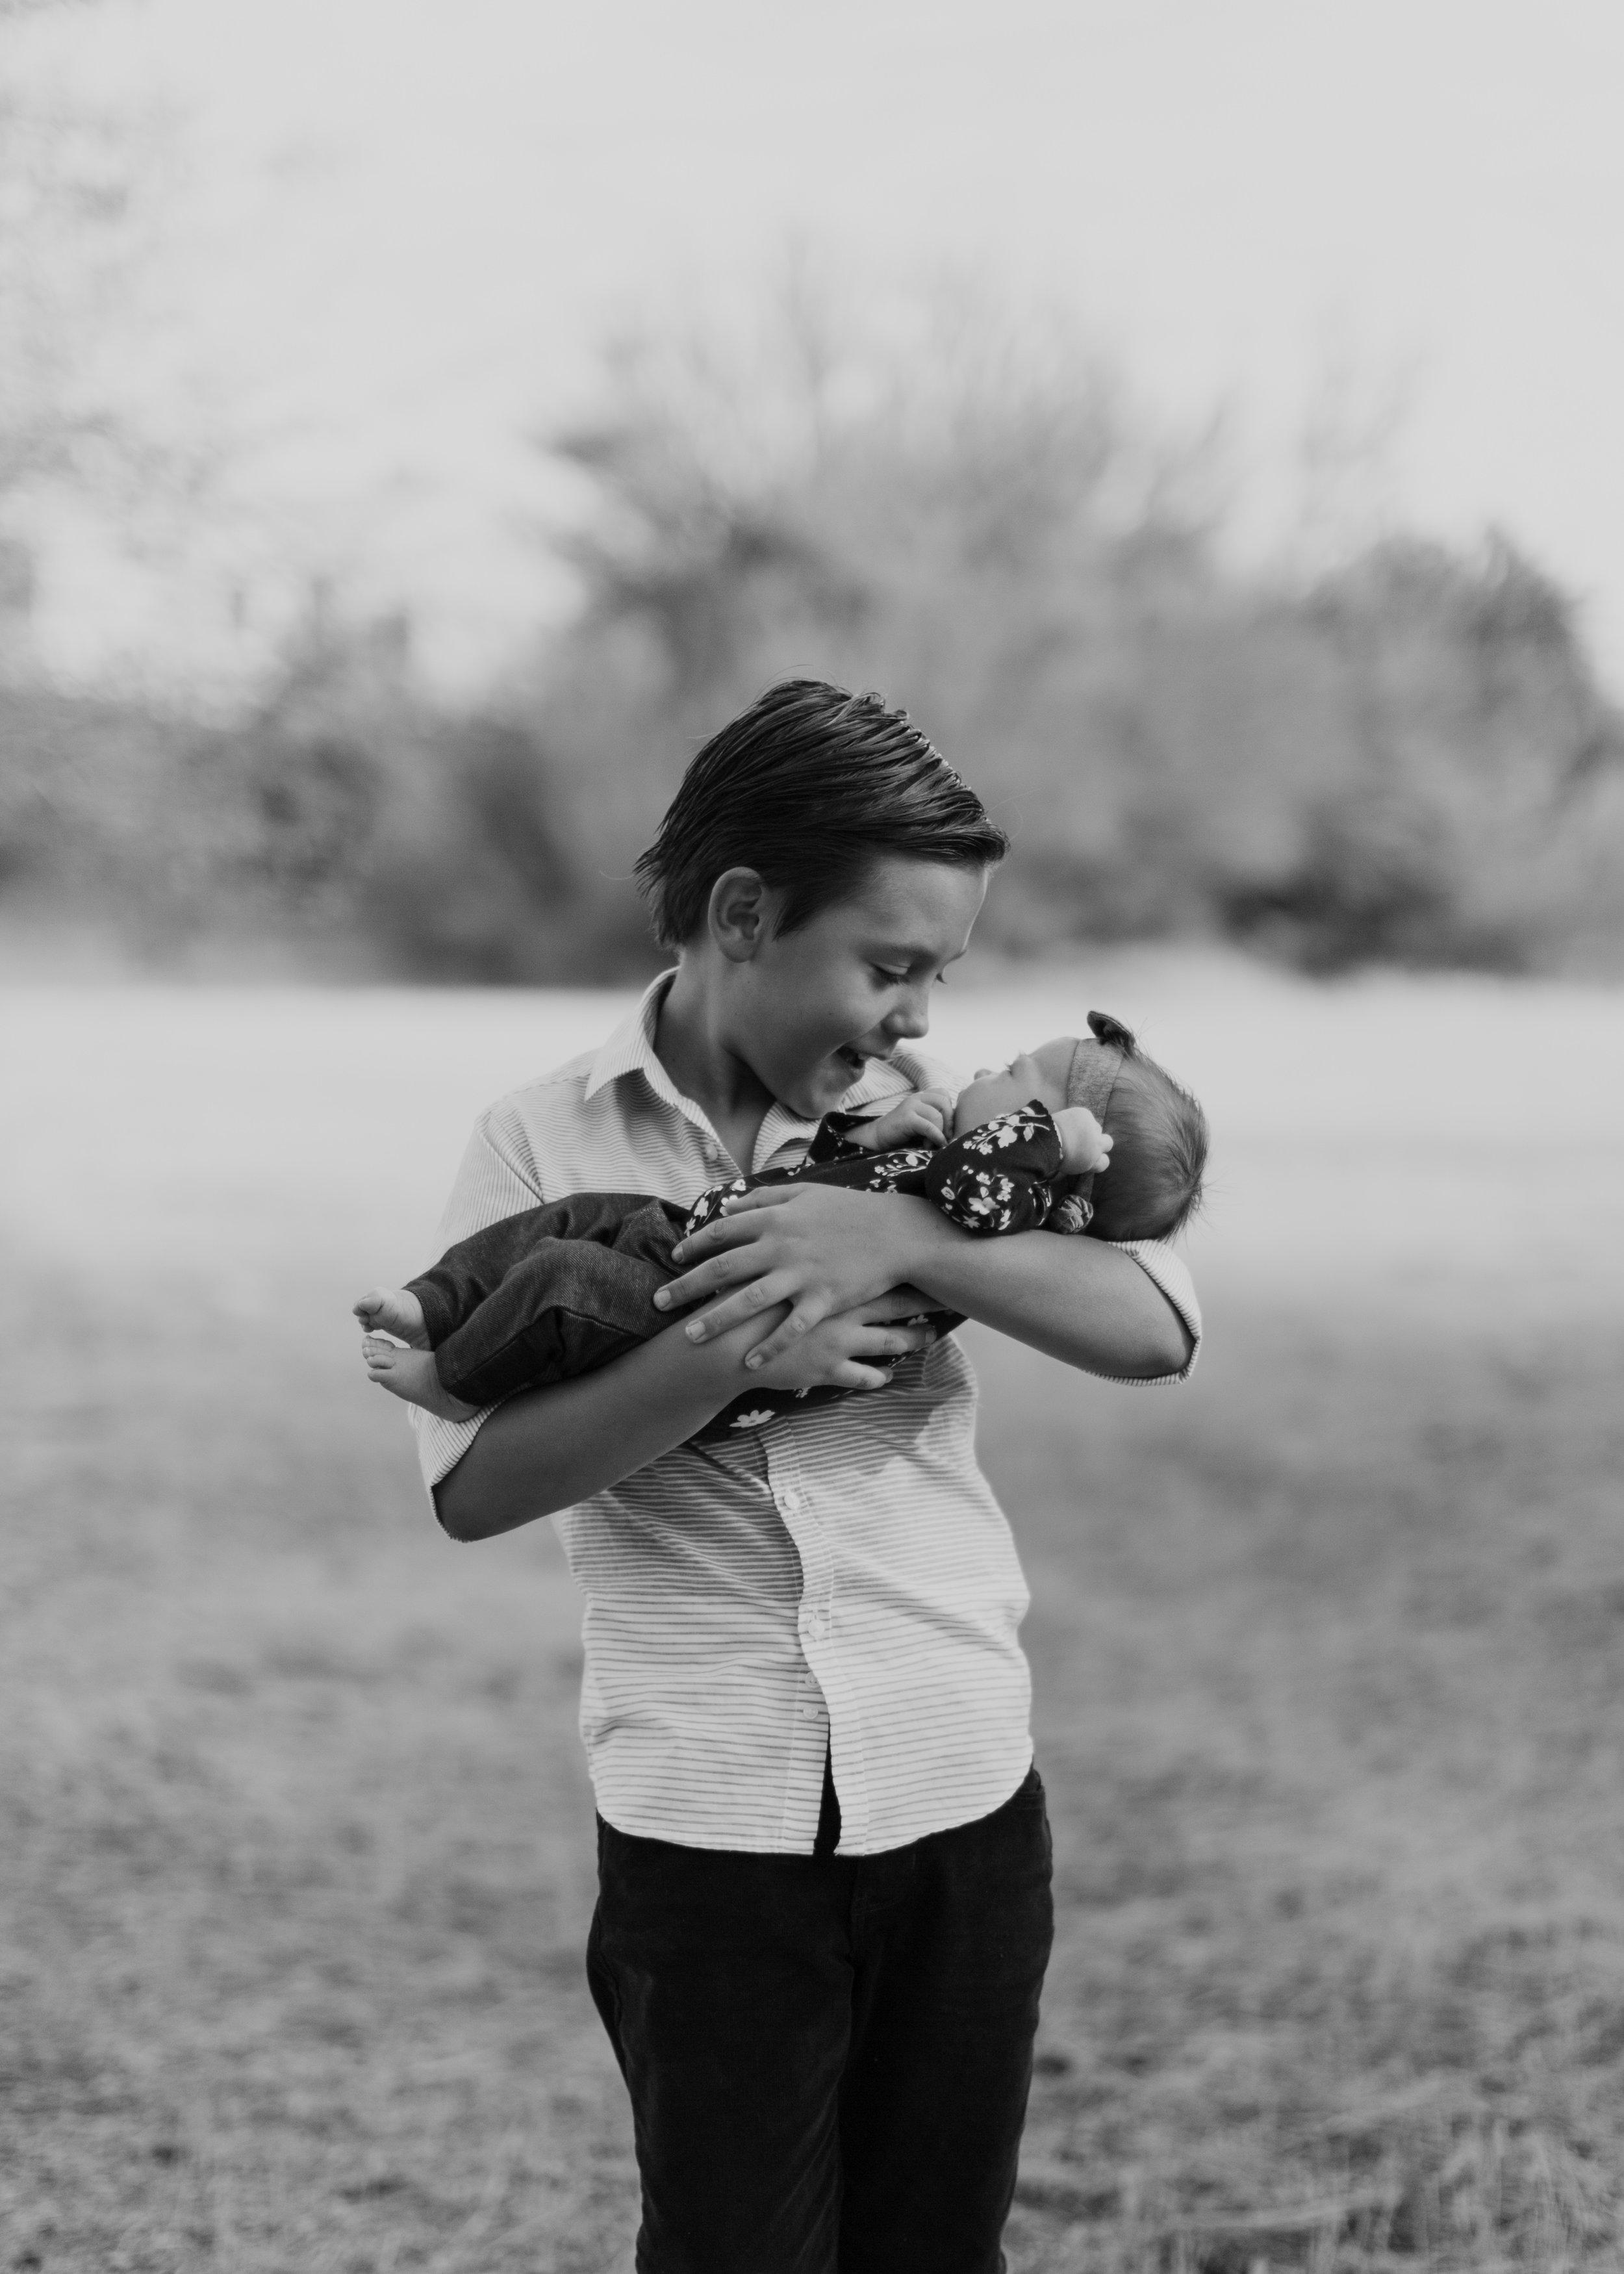 phoenix-family-photography-elan-photographie-studio-5.jpg